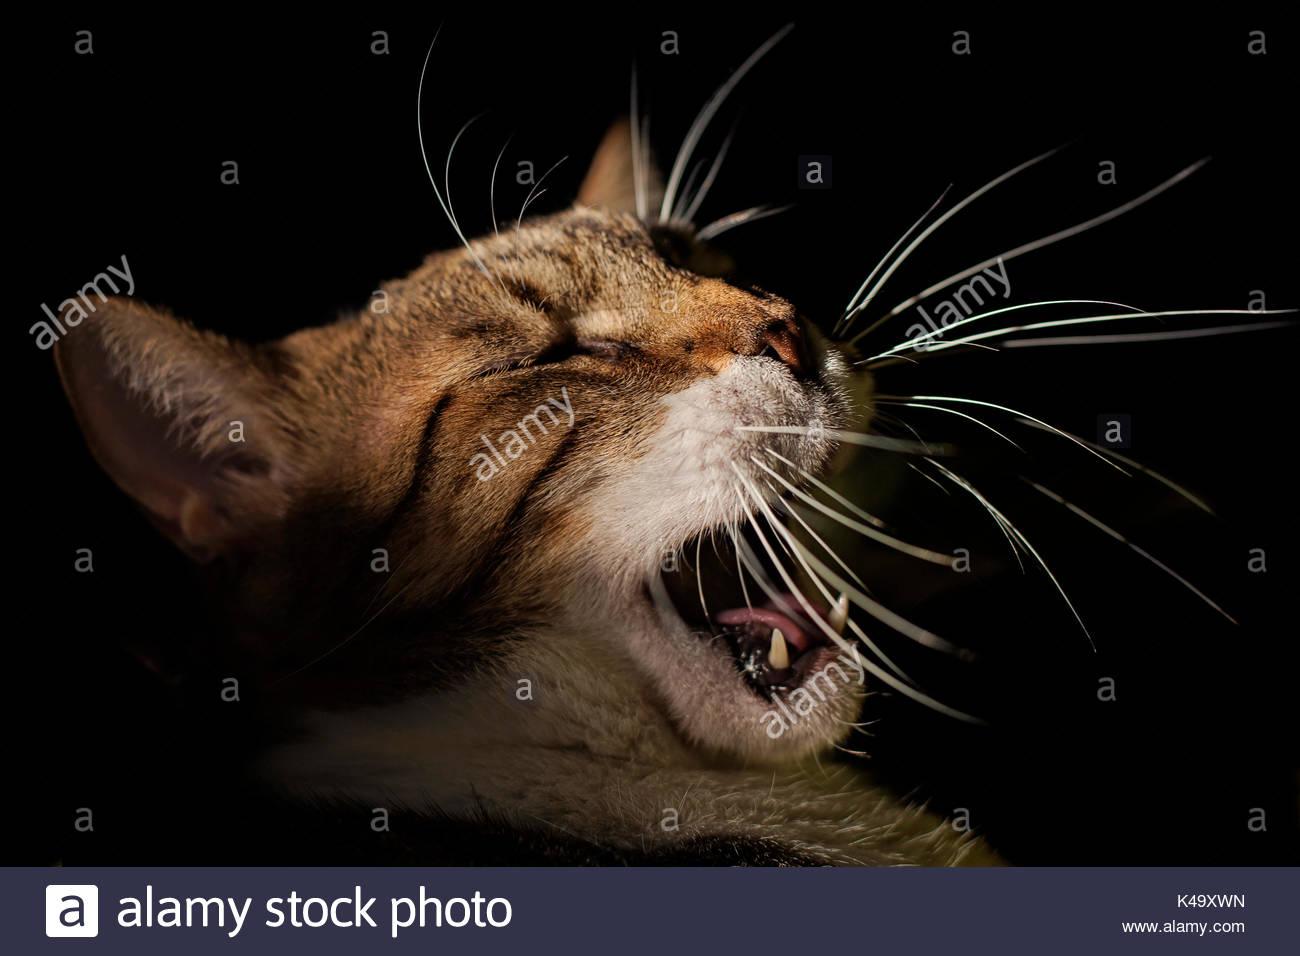 Roaring Cat - Stock Image